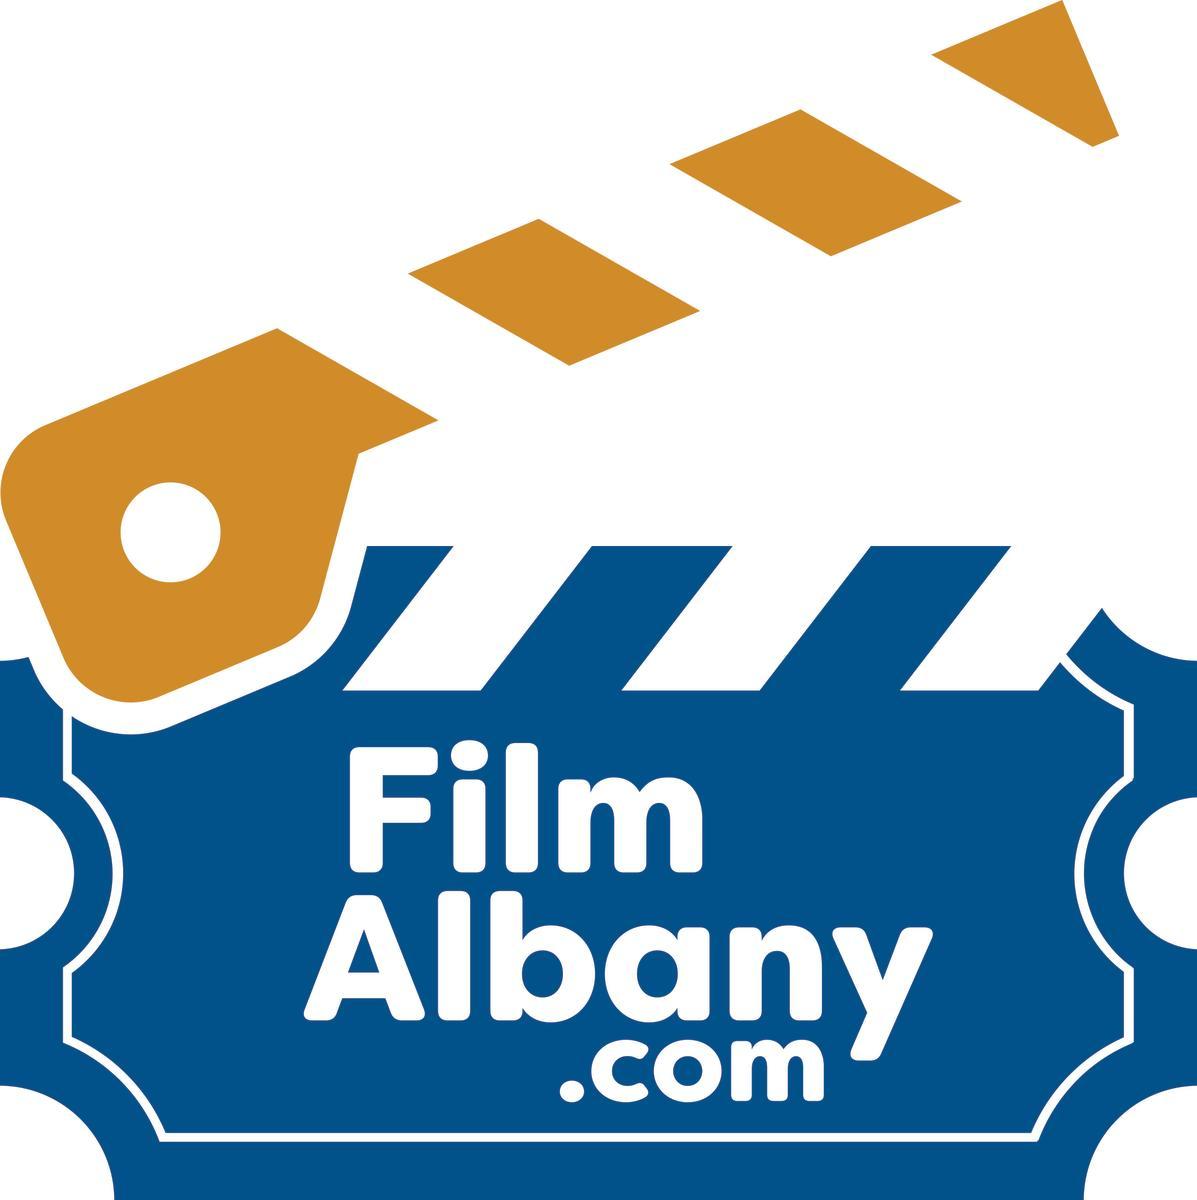 Film Albany